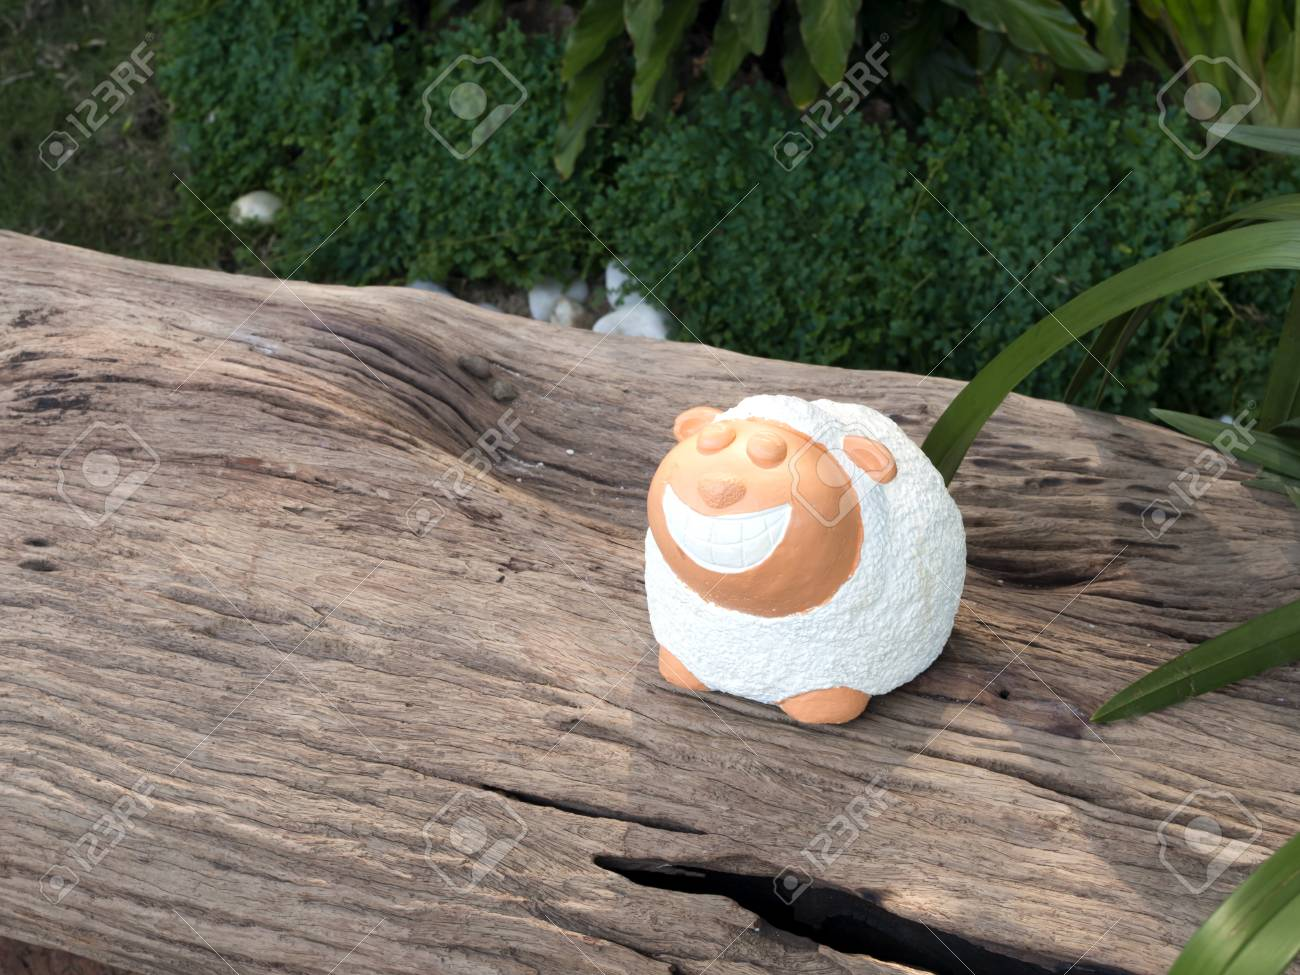 little sheep garden decorative statue on the log Stock Photo - 17902735